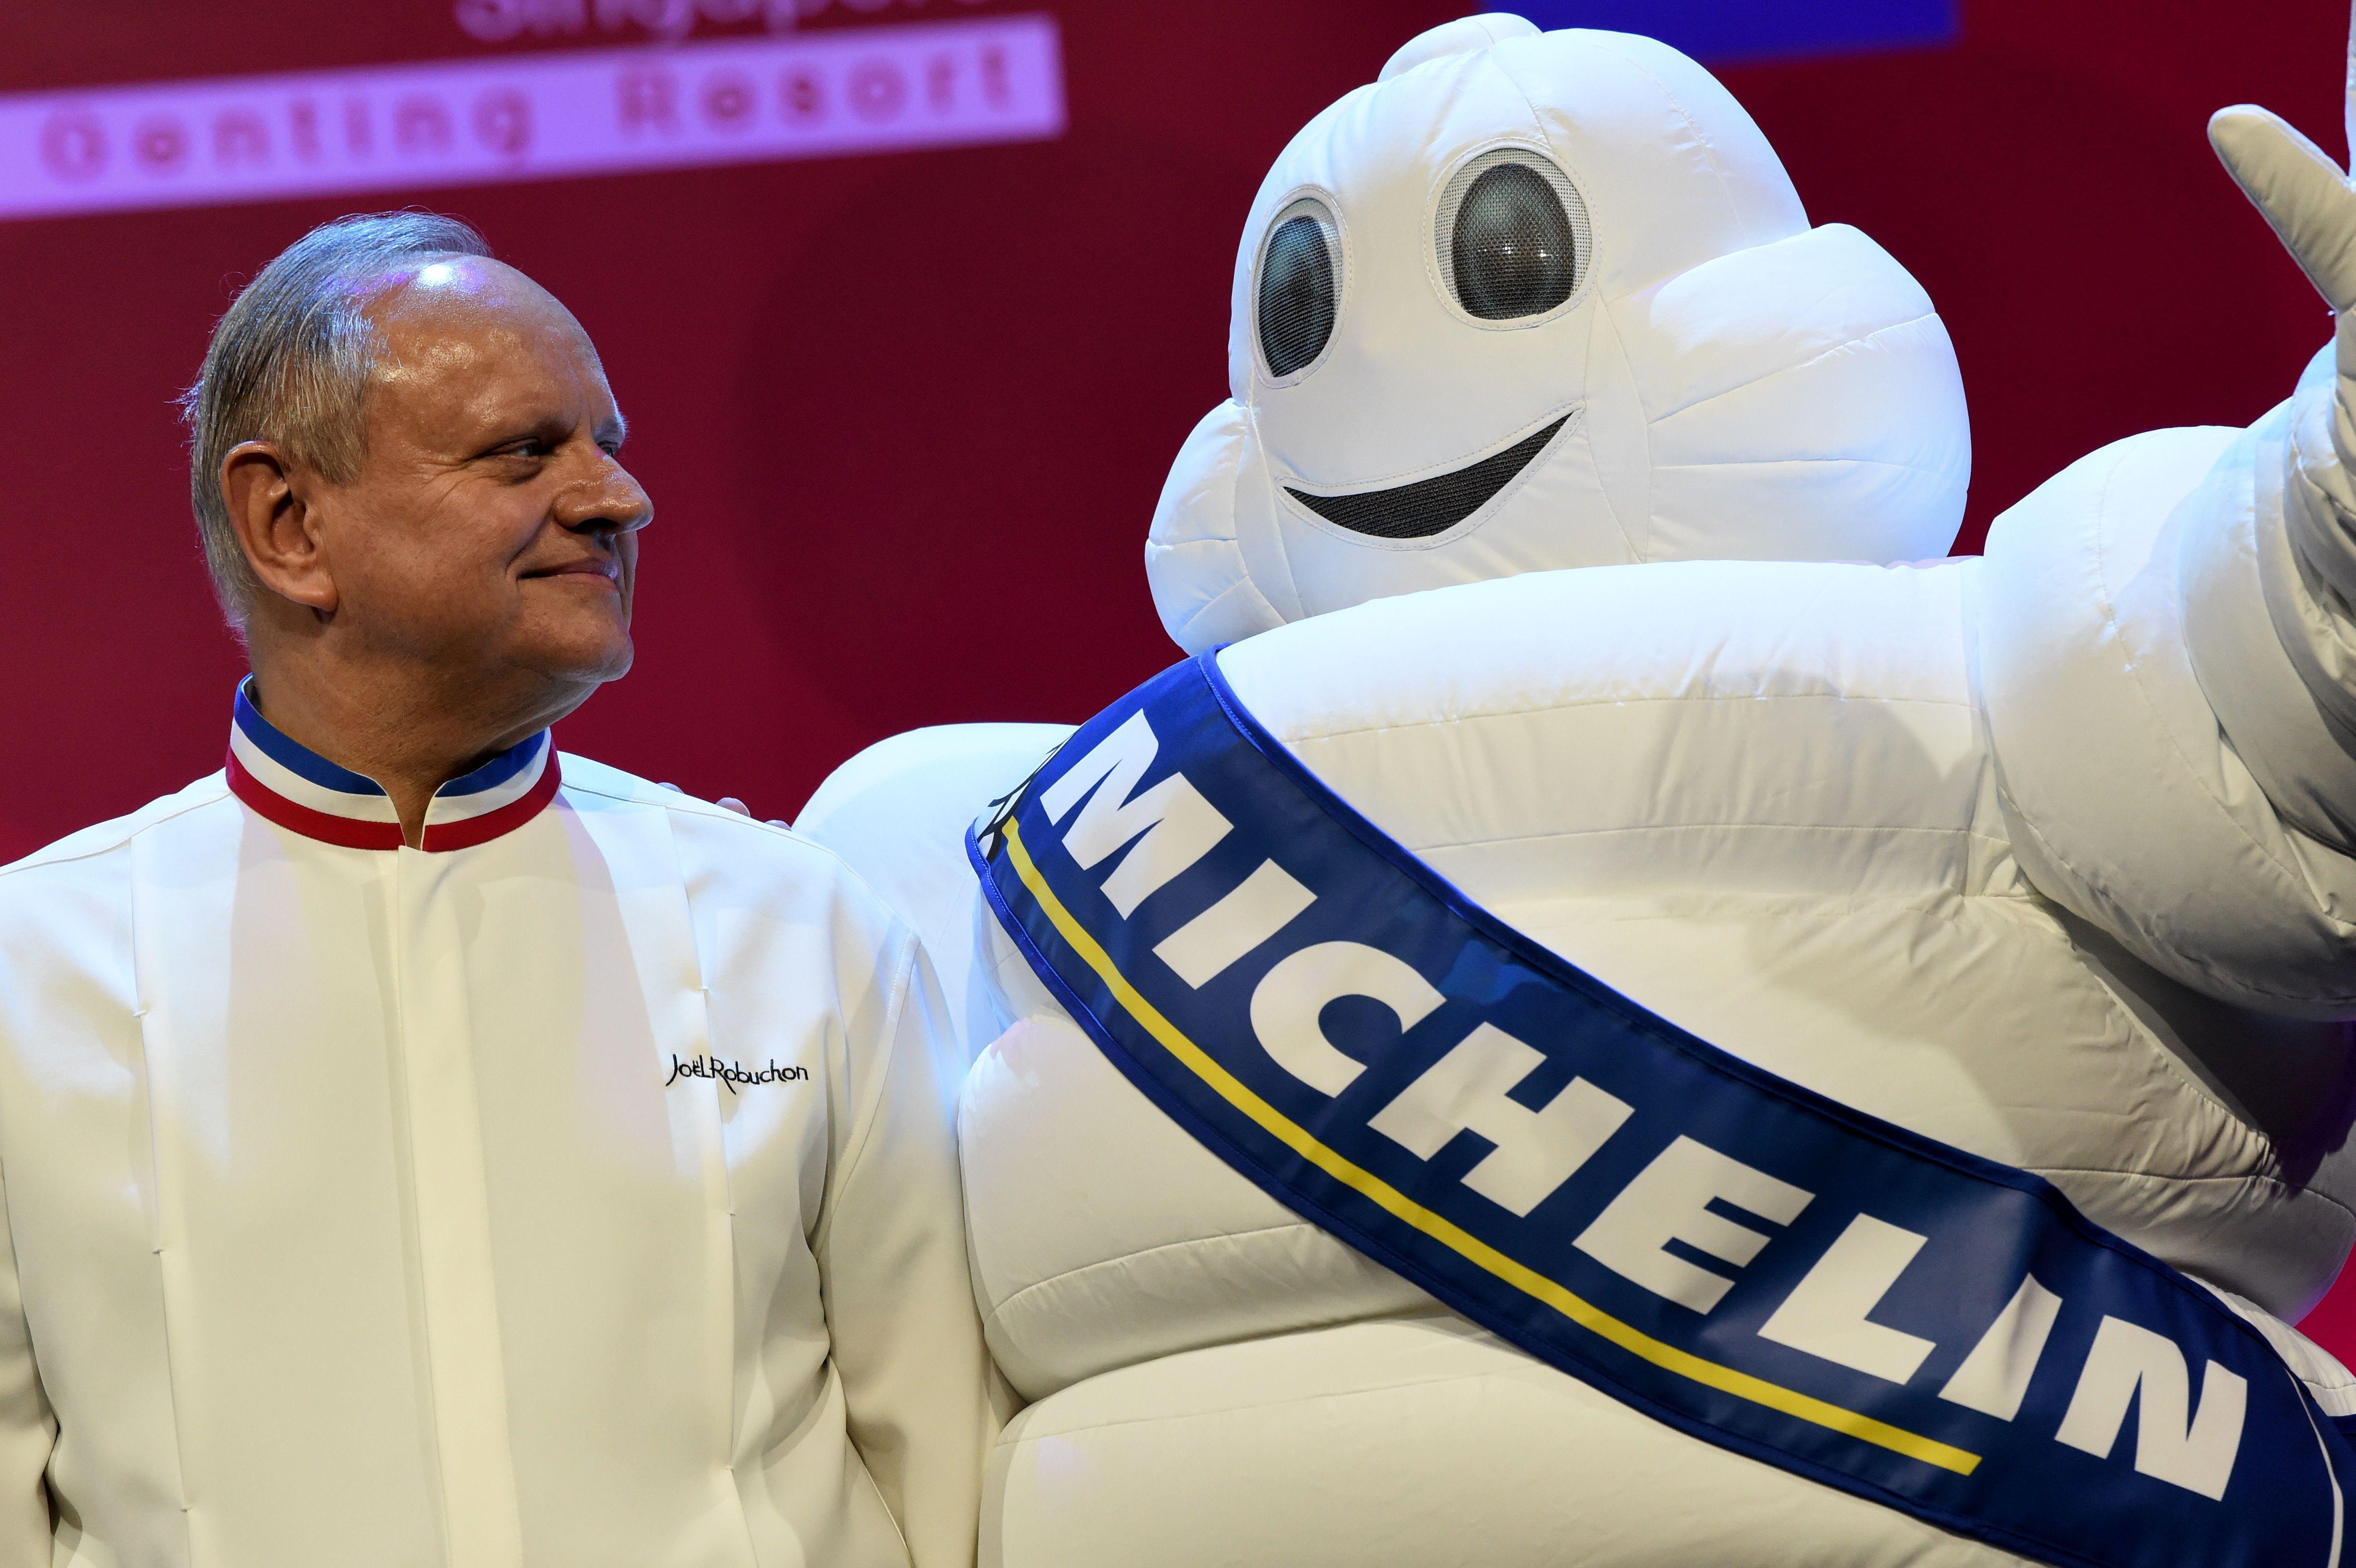 Joel Robuchon and the Michelin mascot